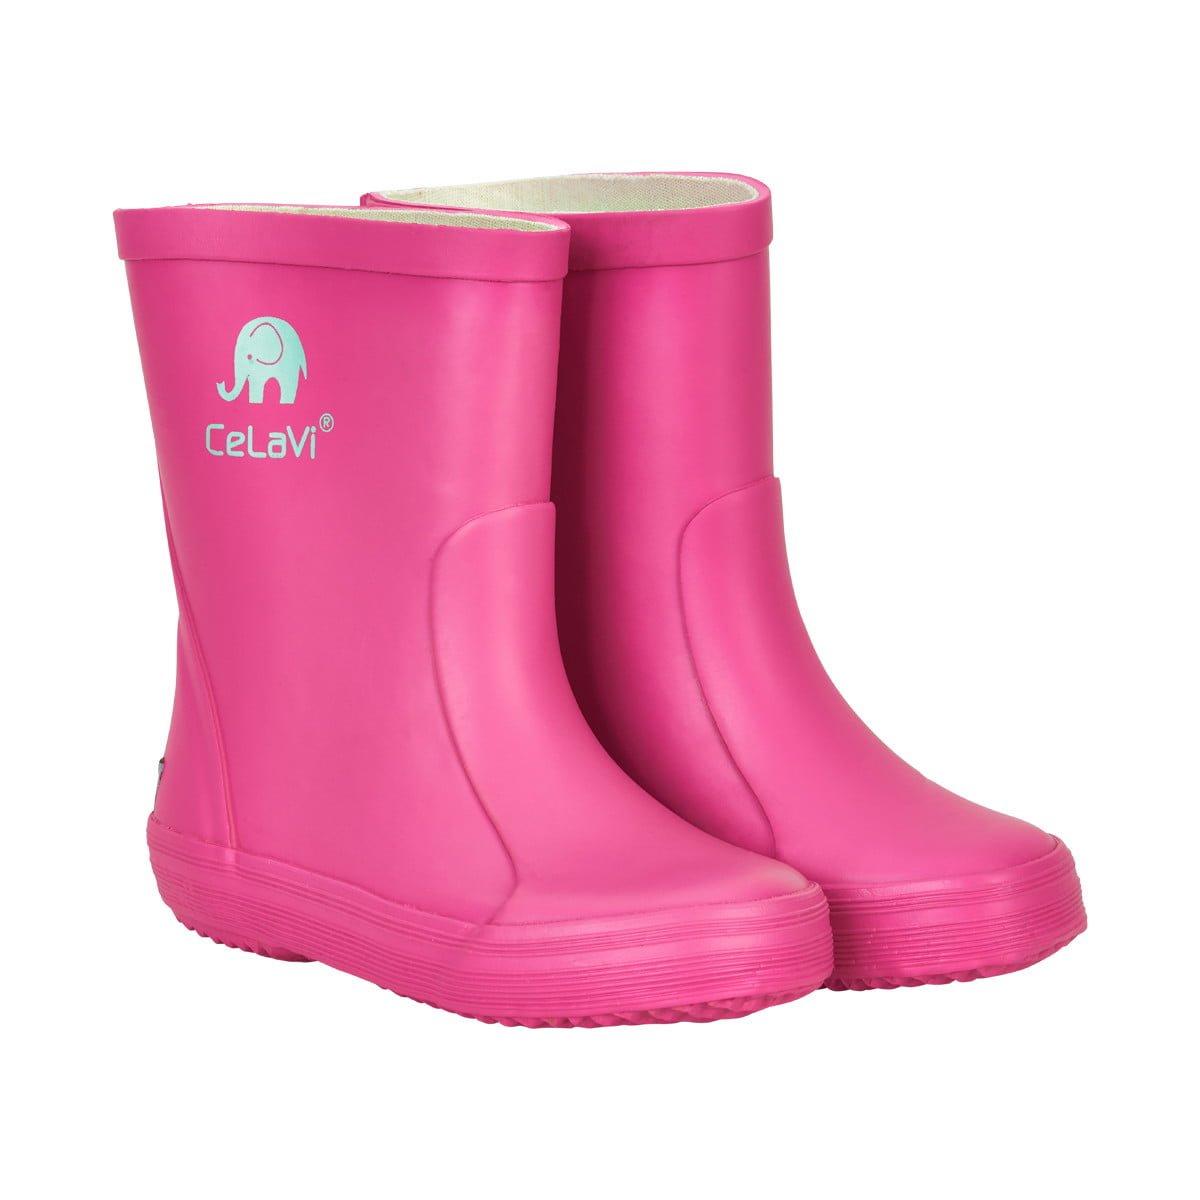 Cizme din cauciuc natural pentru copii real pink CeLaVi